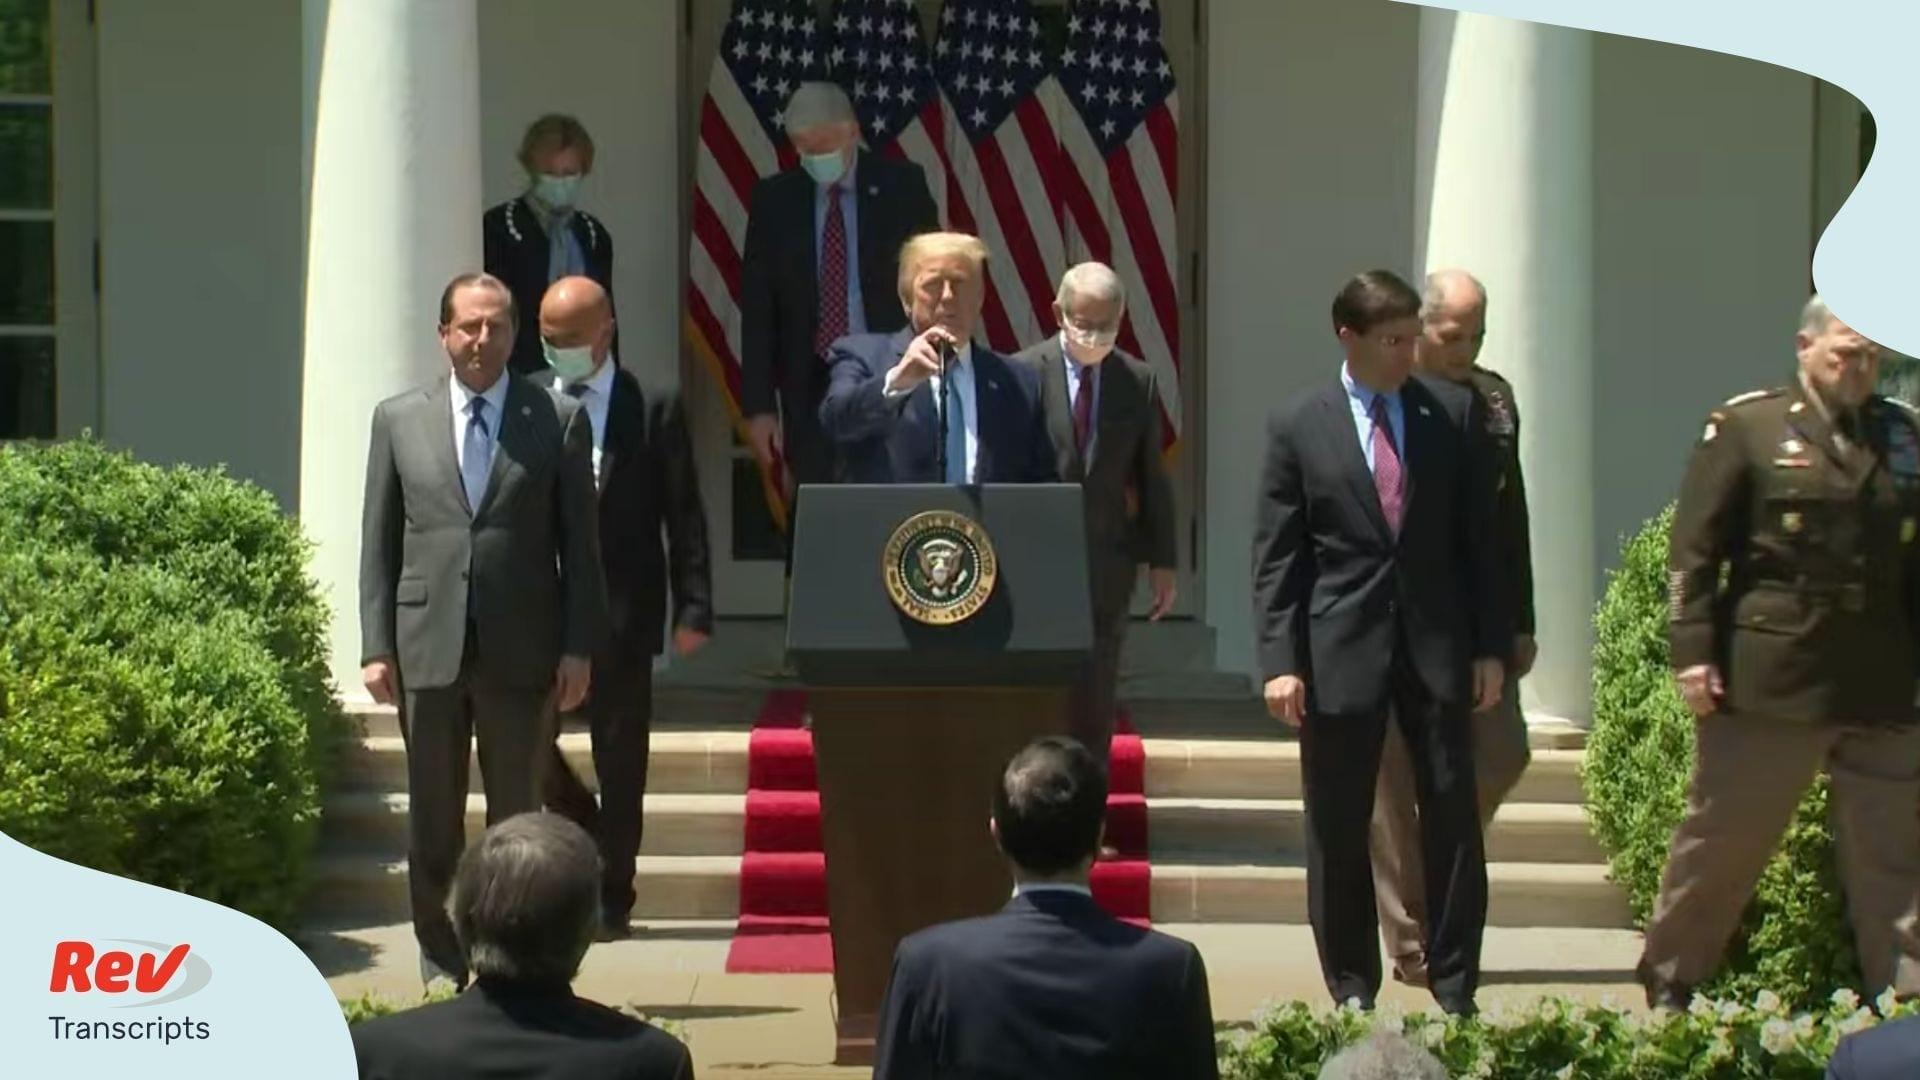 Trump update on COVID-19 vaccine development May 15